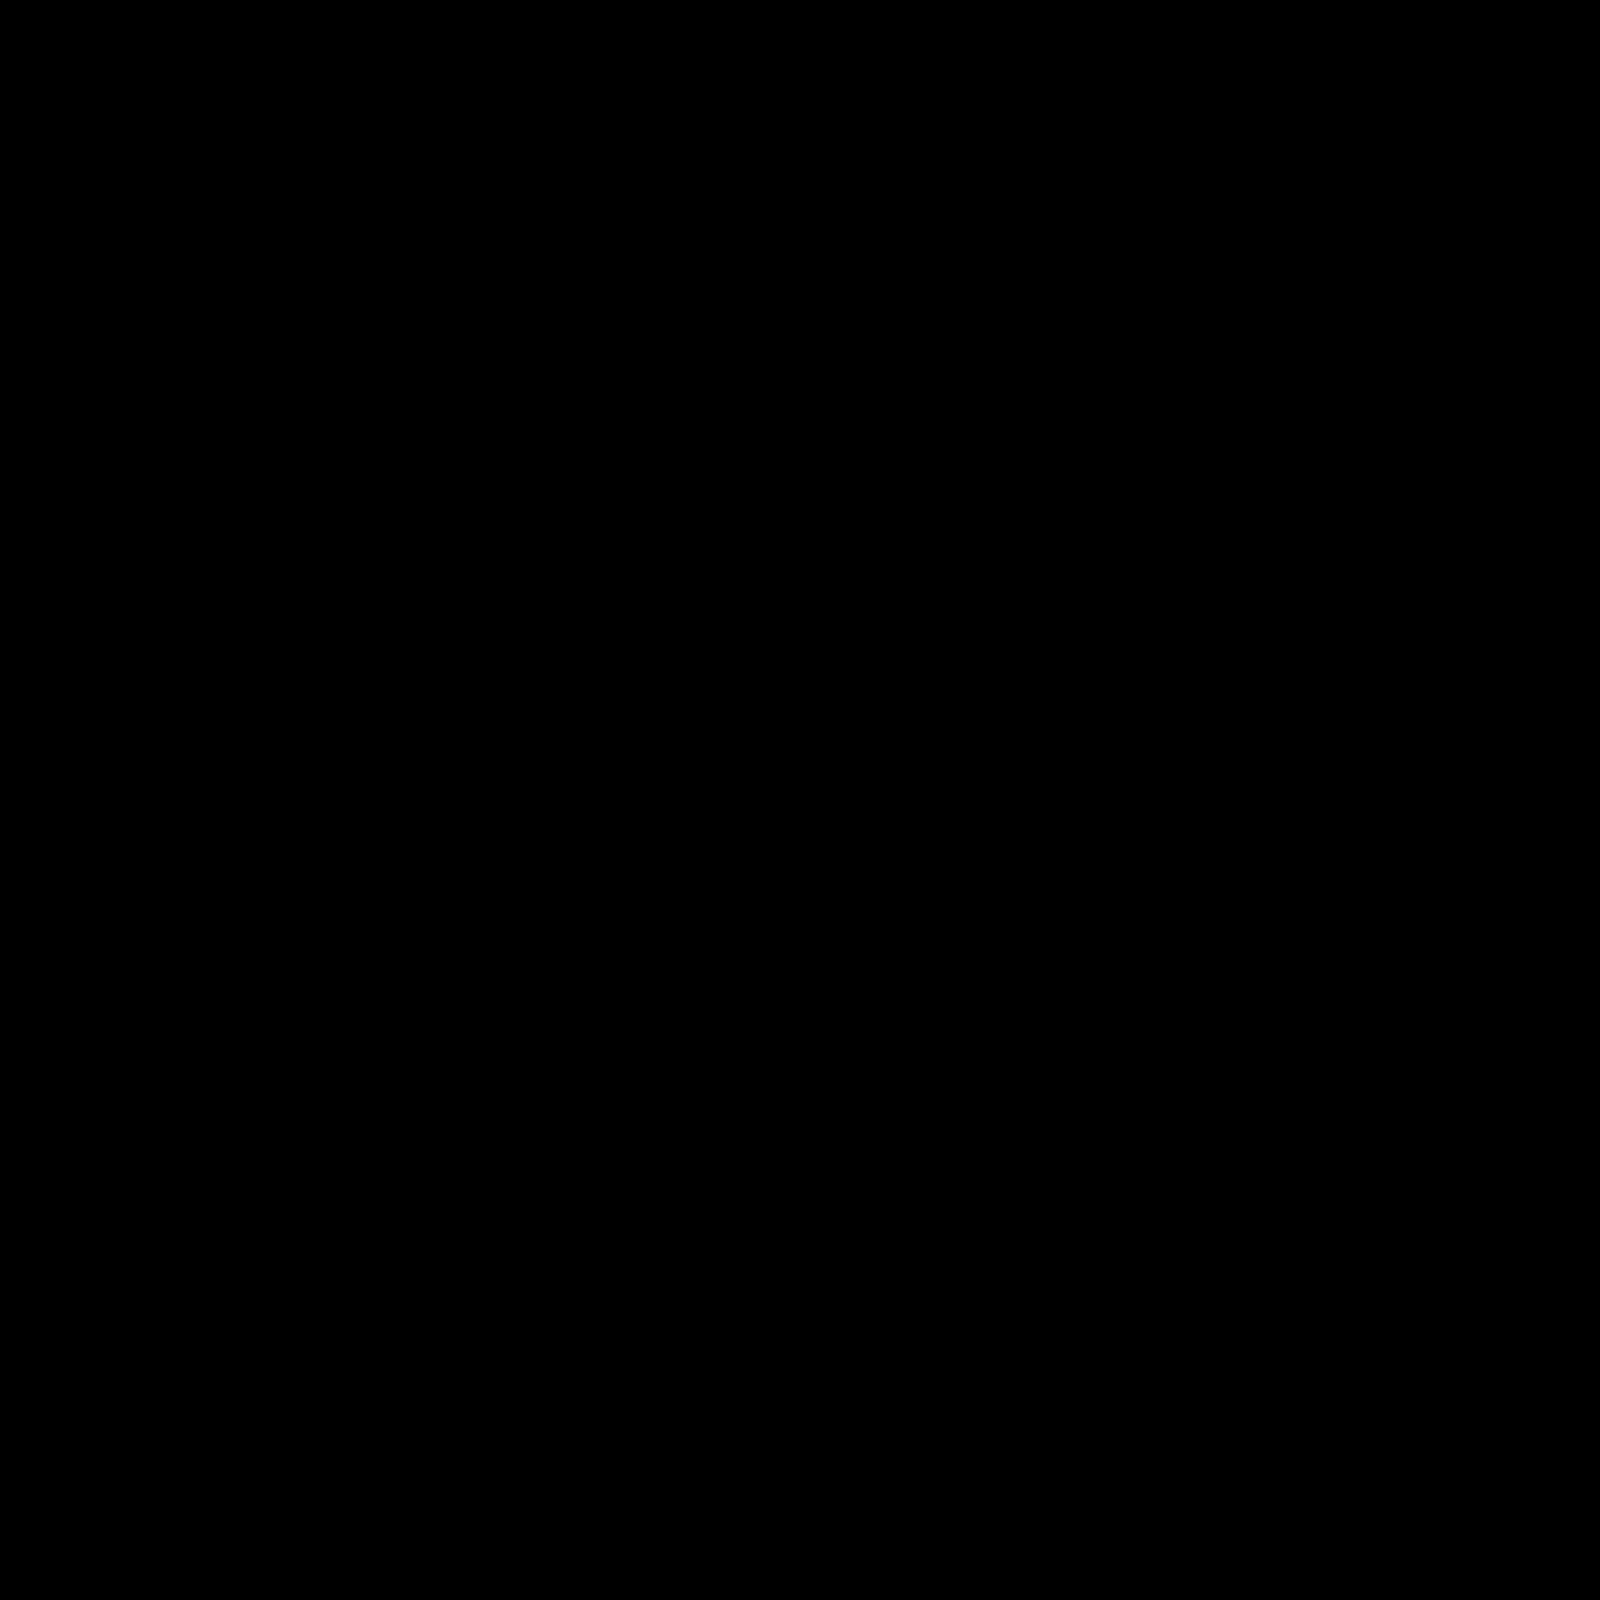 Blockly Light Green icon